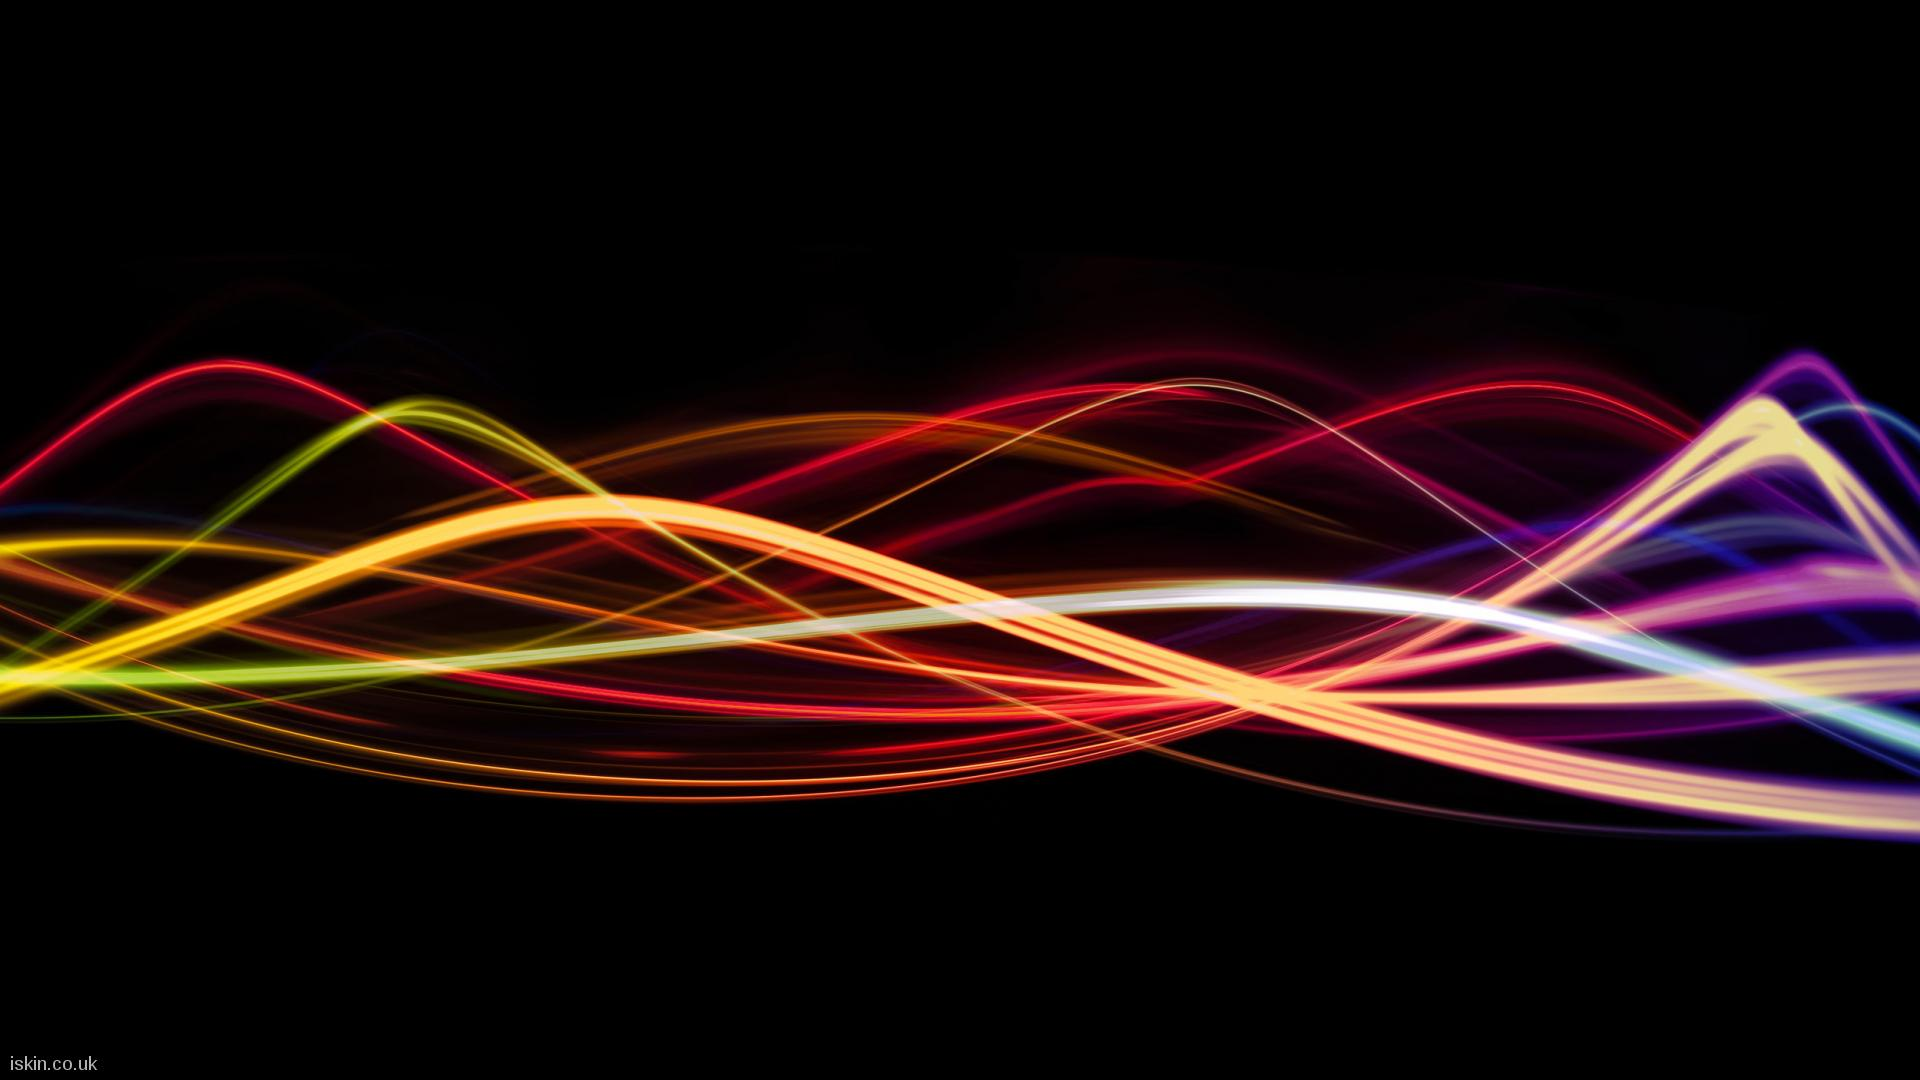 lightwaves lines of light desktop wallpaper iskin co uk